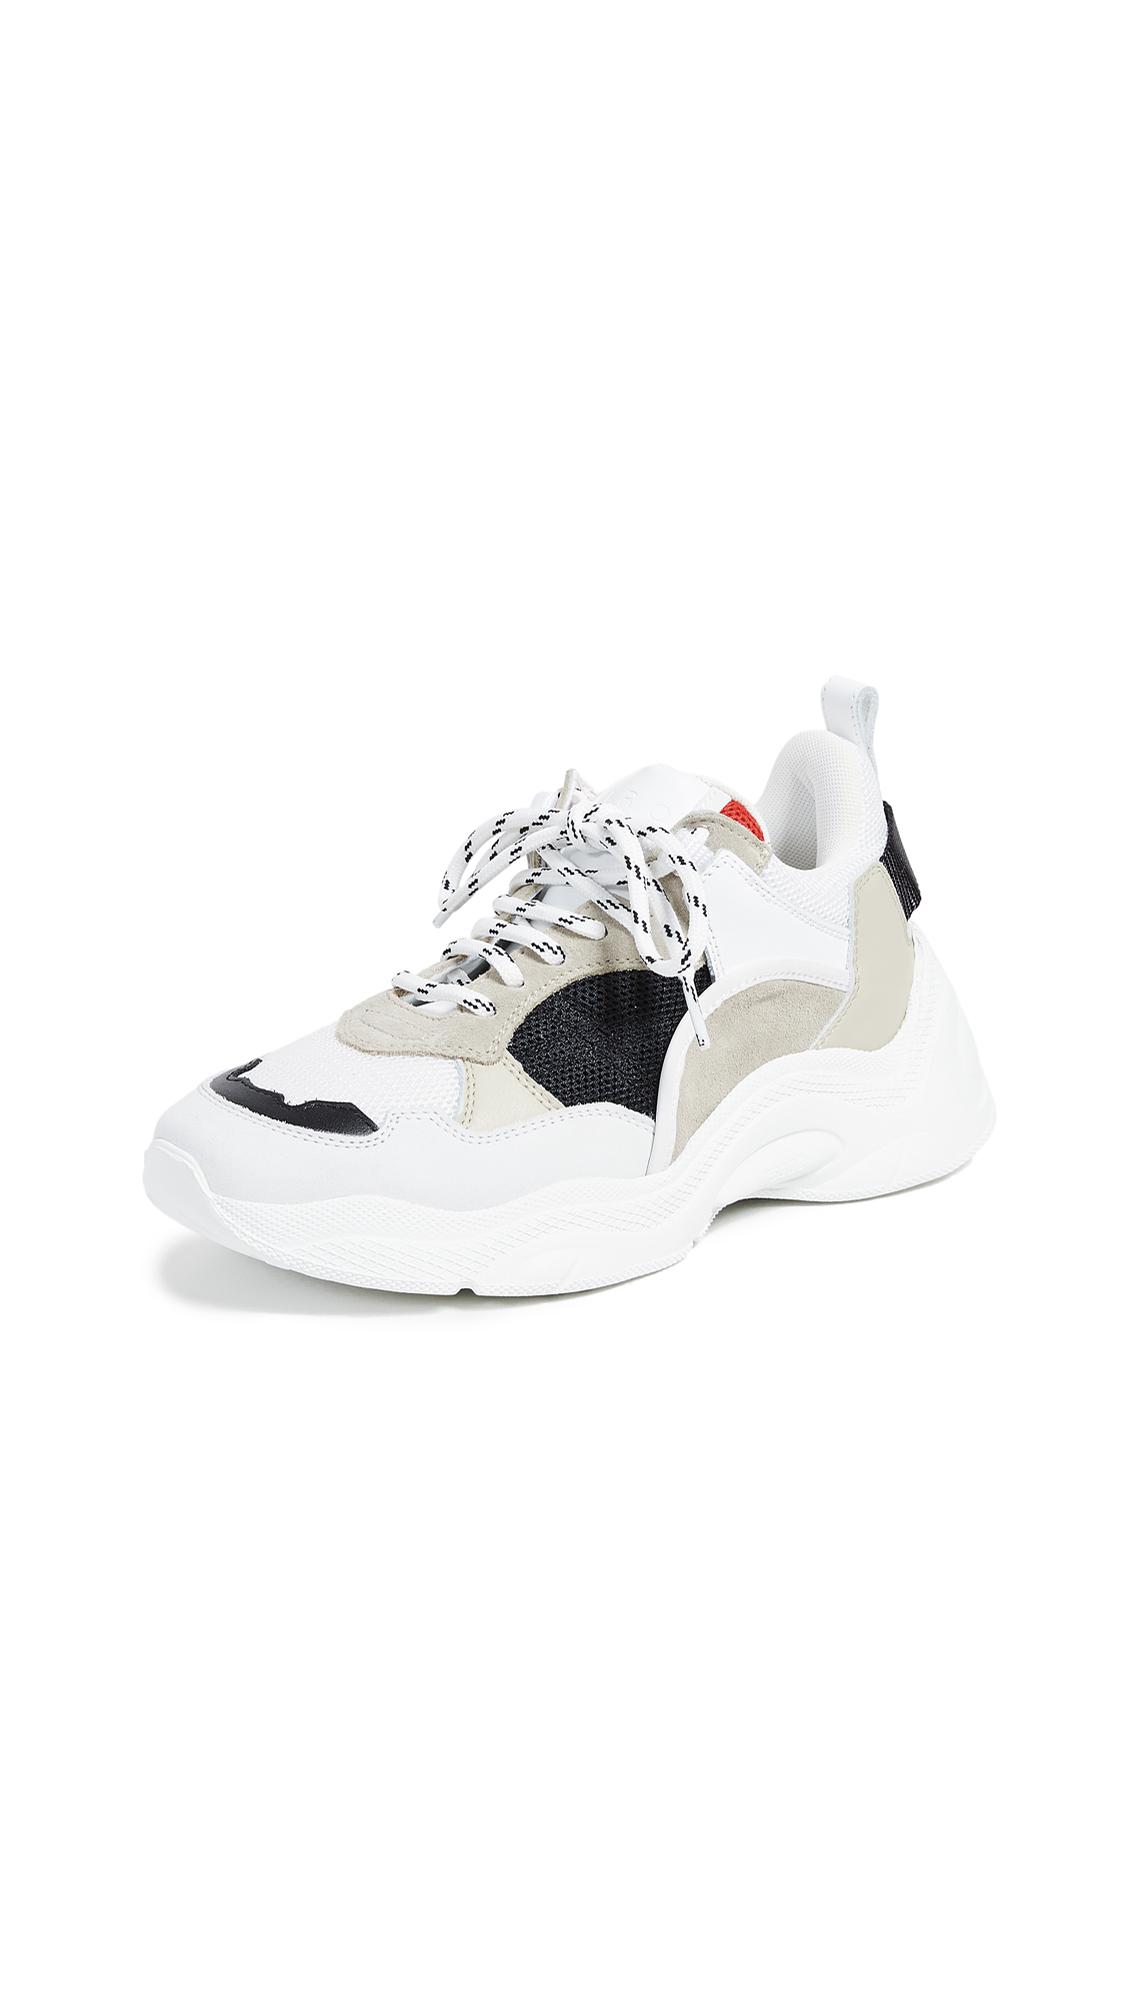 IRO Curverunner Sneakers - Beige/Black